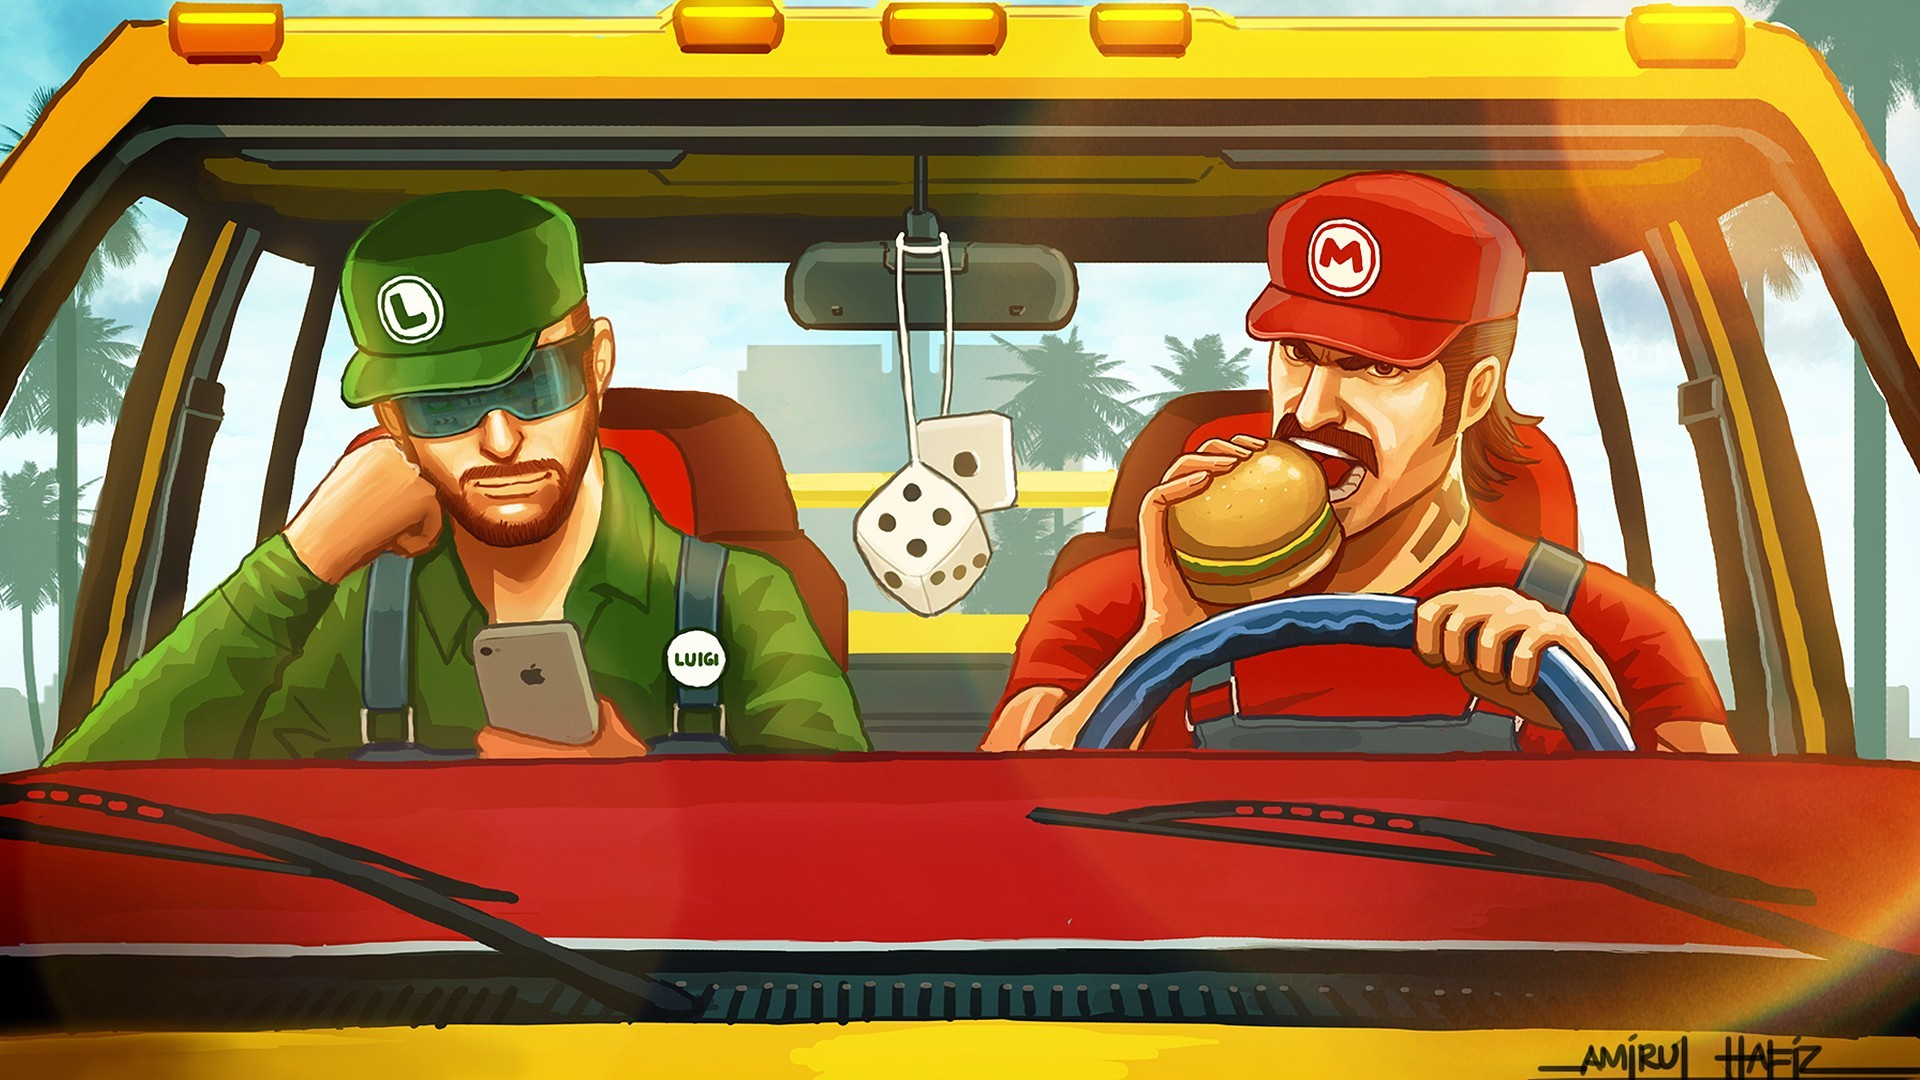 Mario Luigi Hamburger iPhone Dice game games humor funny wallpaper